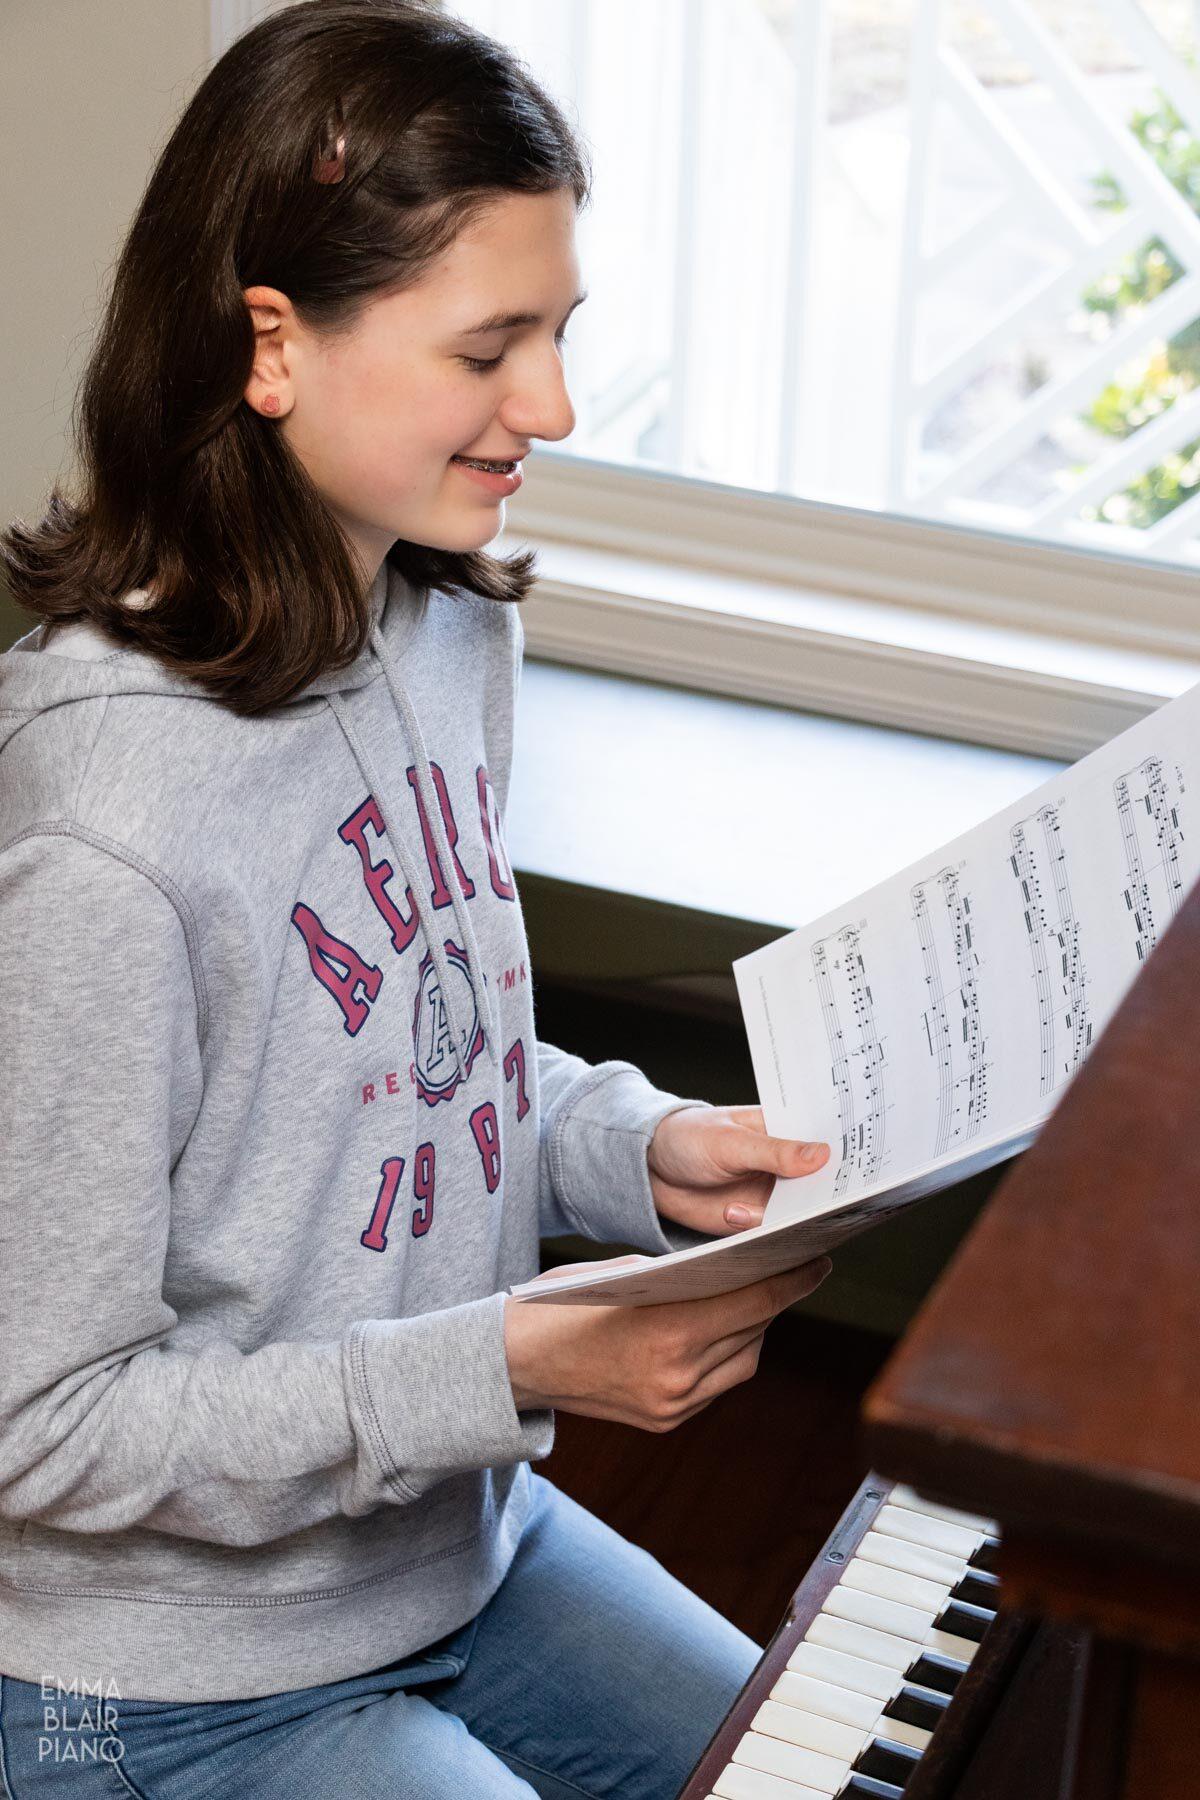 teenage girl looking at a music book at the piano